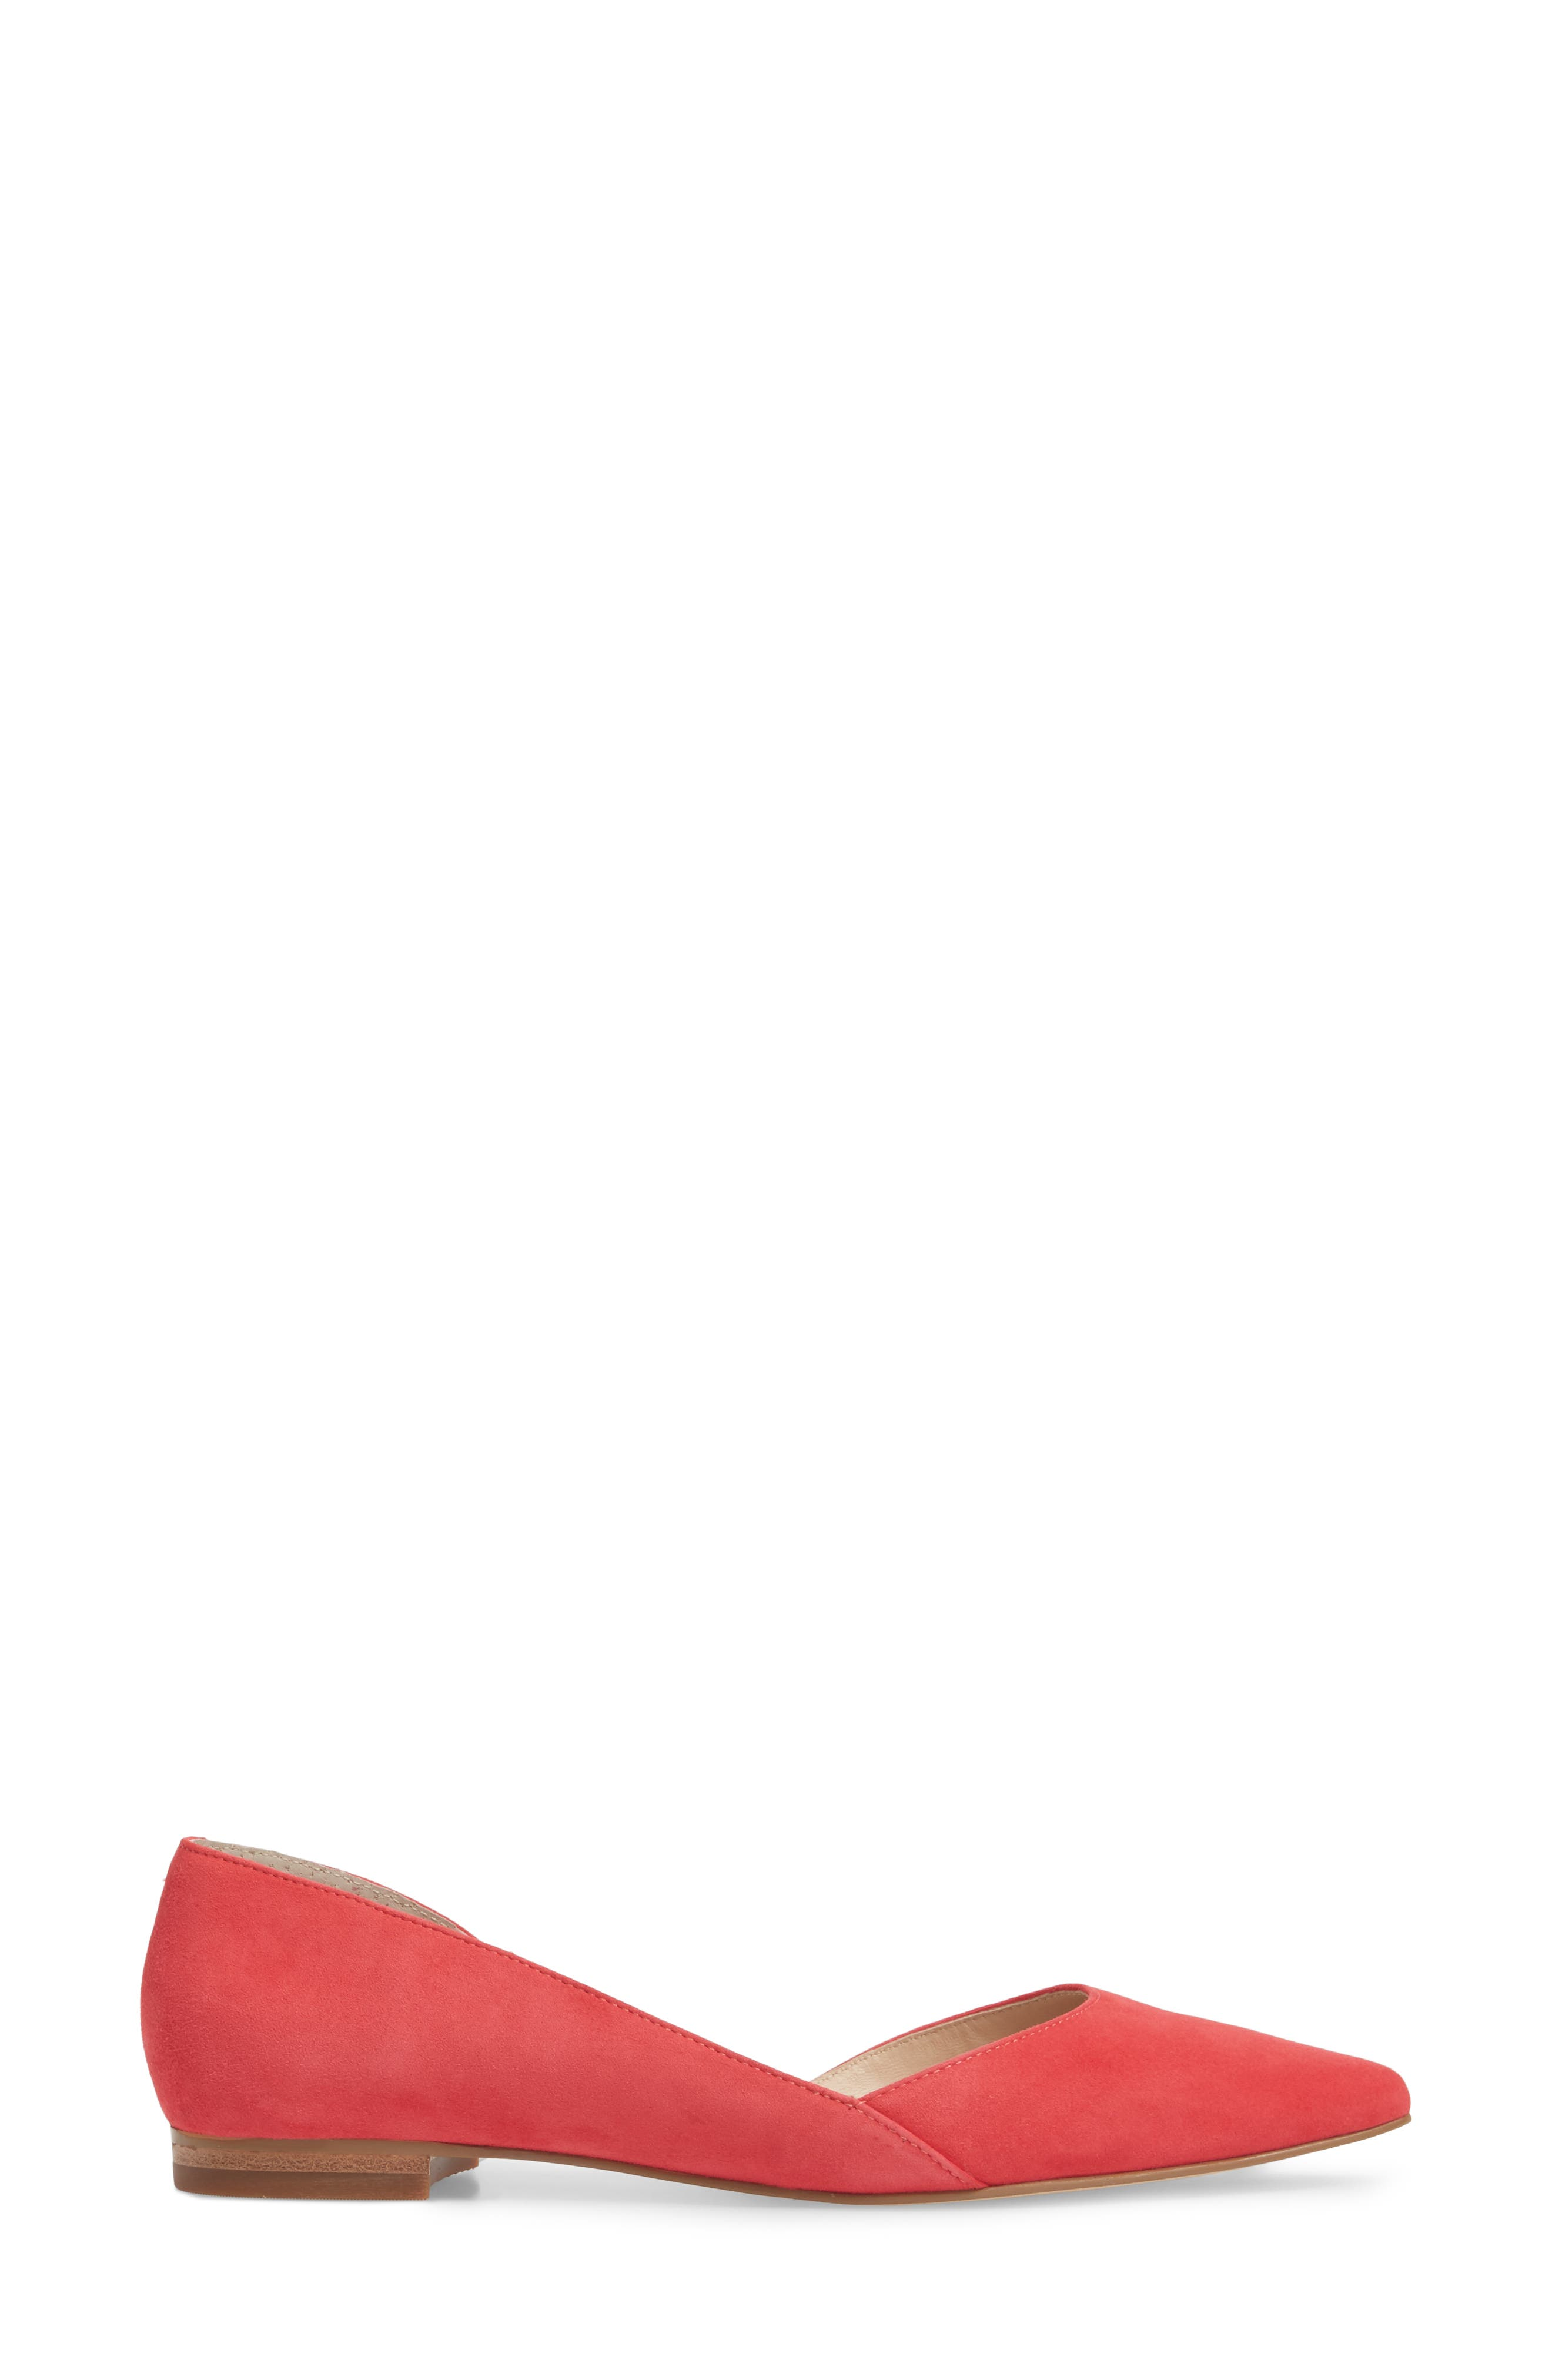 'Sunny' Half d'Orsay Flat,                             Alternate thumbnail 110, color,